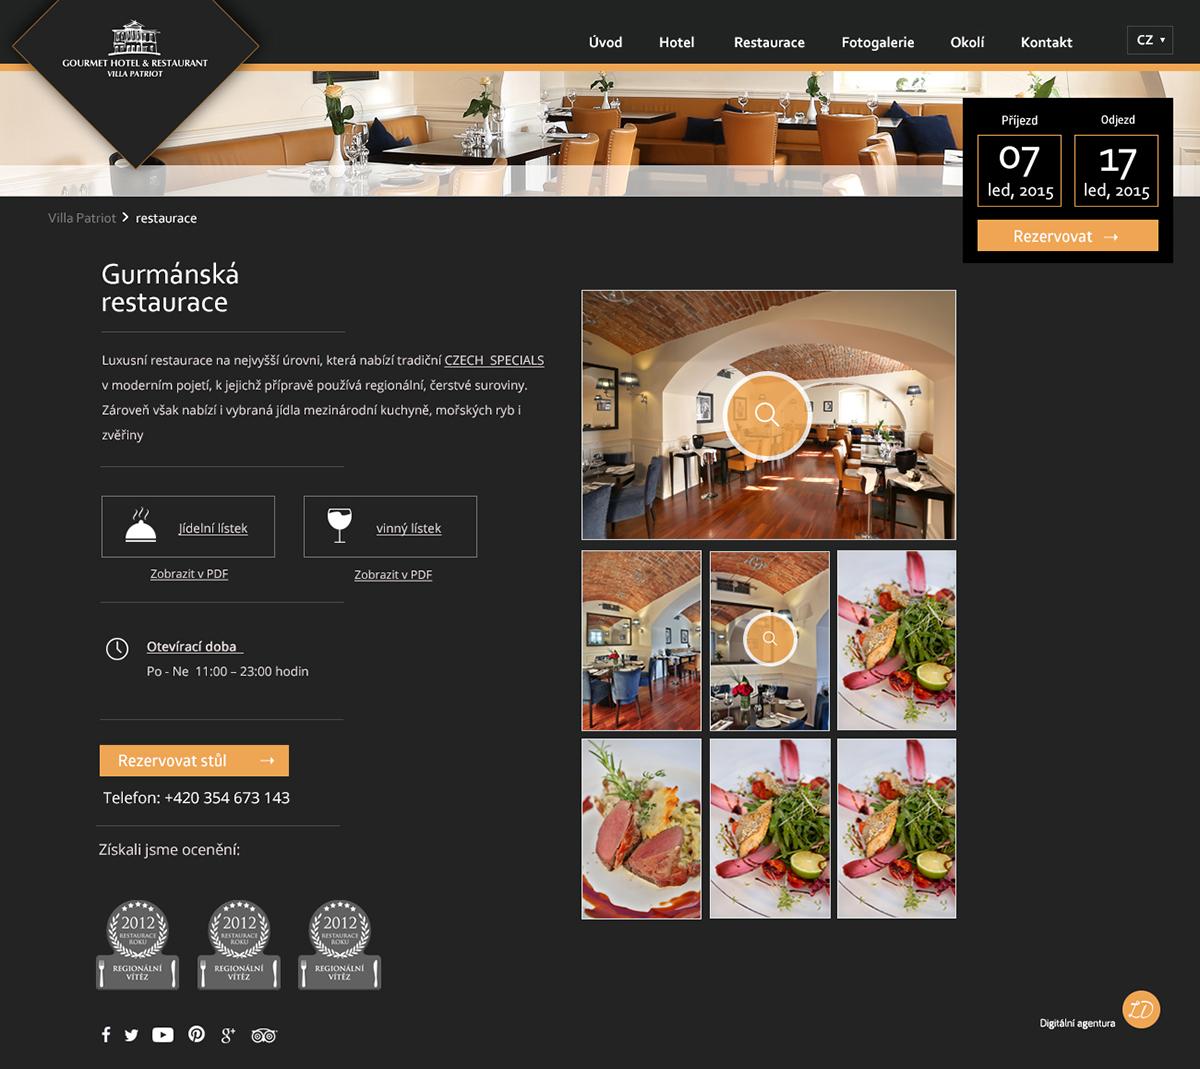 Webdesign hotel reservation luxury black gourmet restaurant Website Web cesky Czech